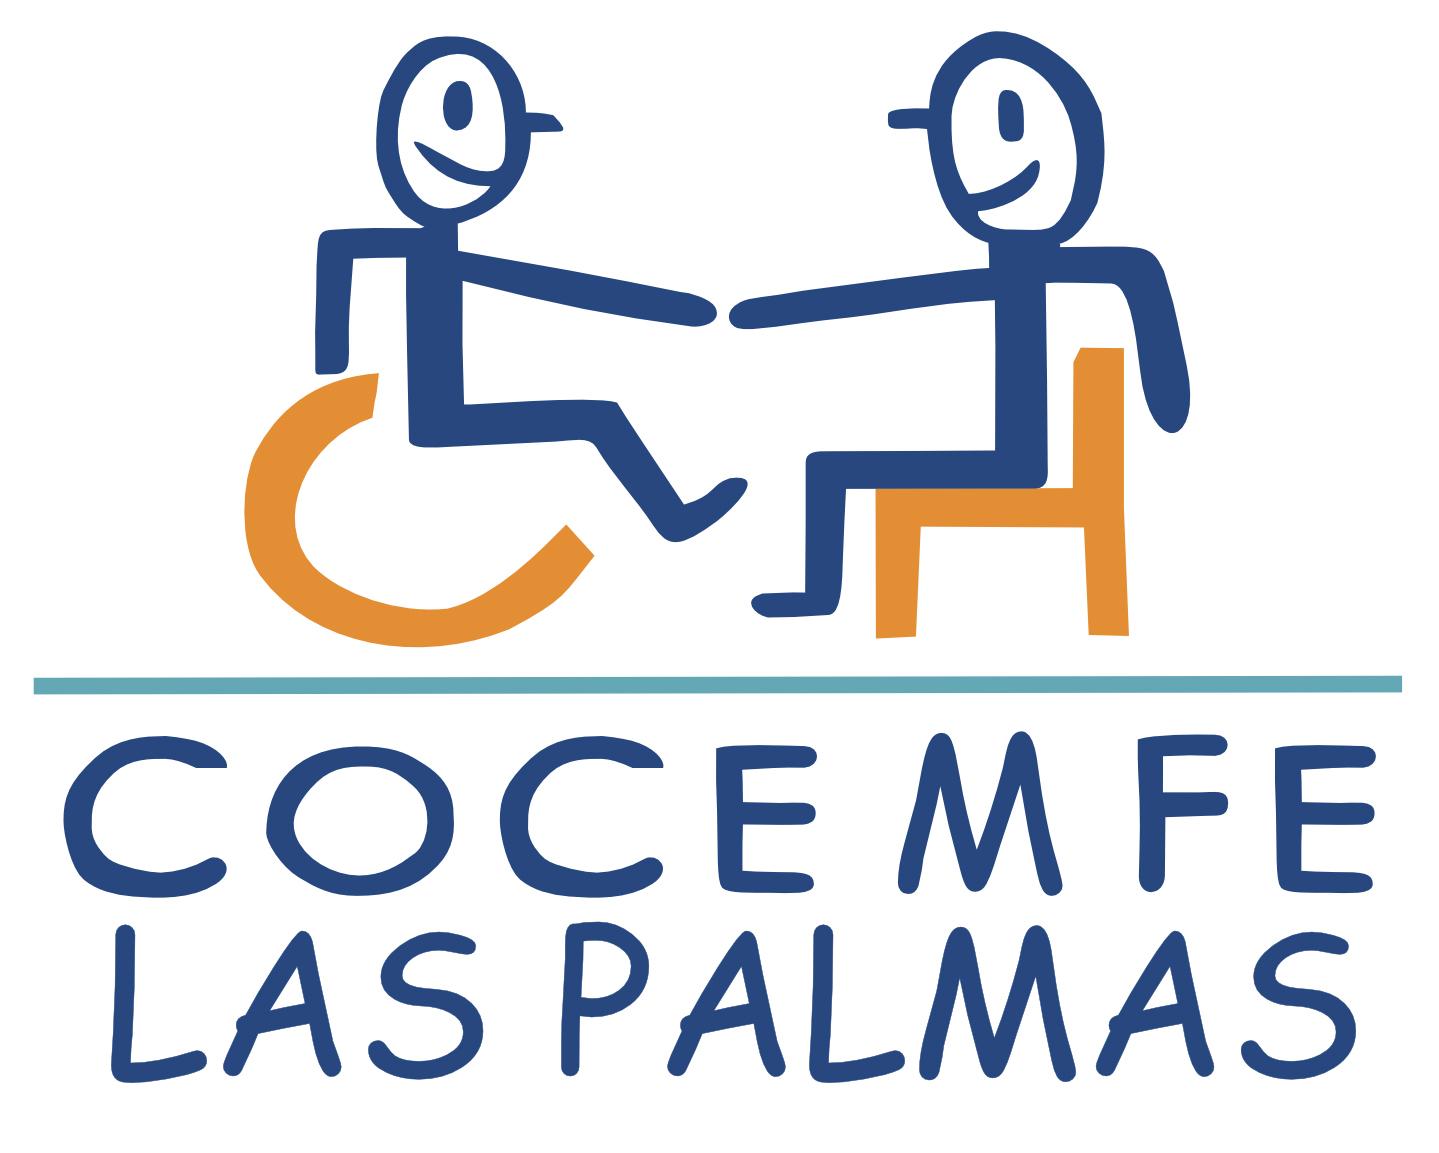 Cocemfe Las Palmas